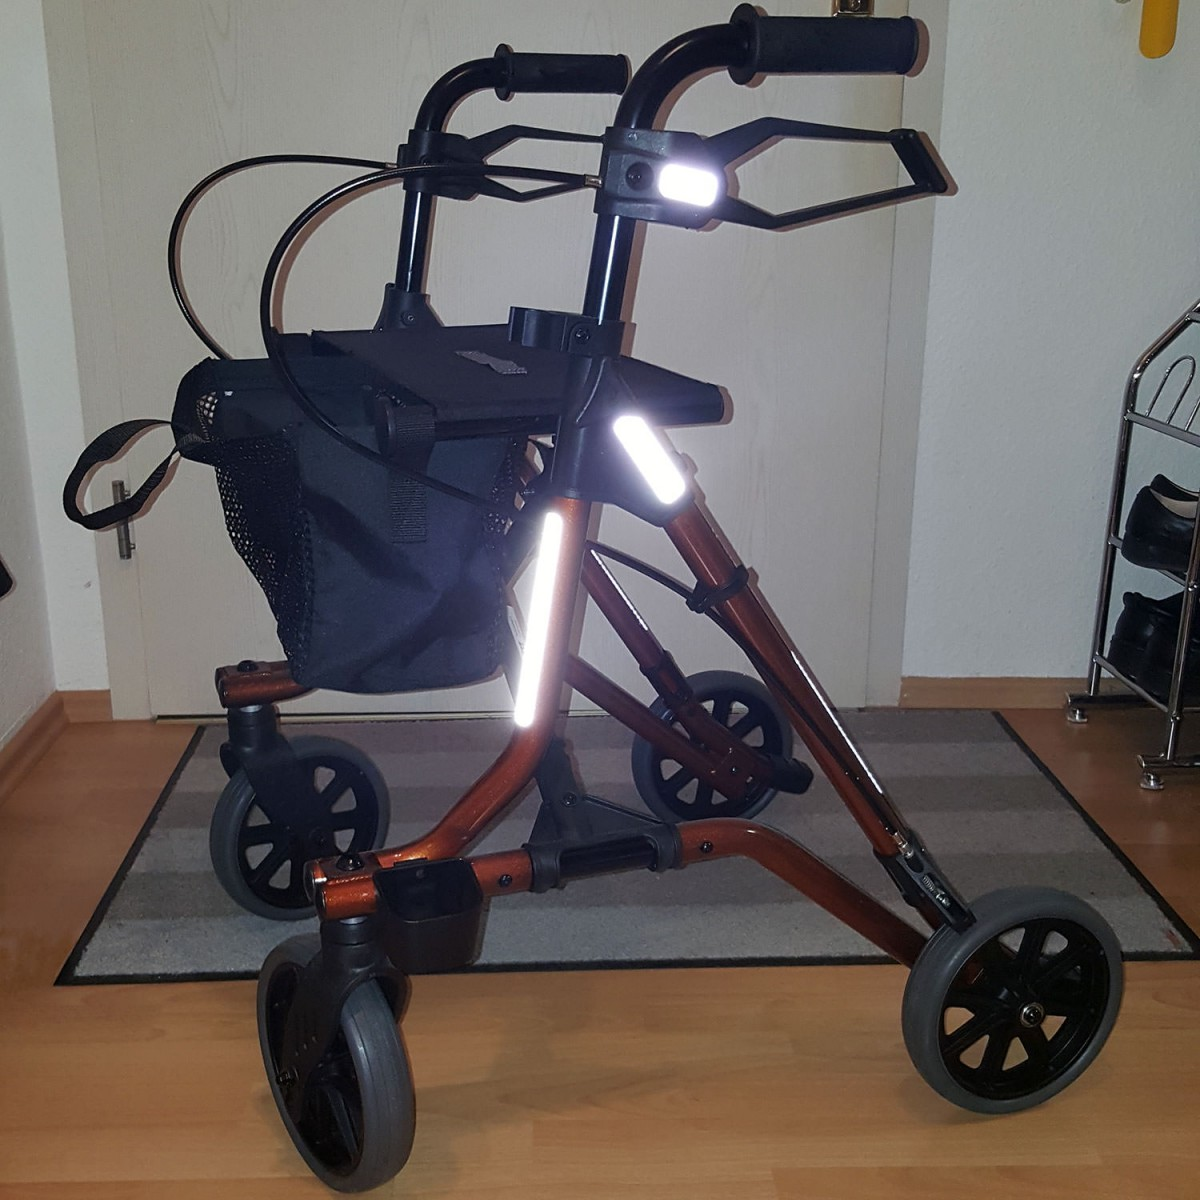 reflektor set zum kleben f r fahrrad kinderwagen. Black Bedroom Furniture Sets. Home Design Ideas